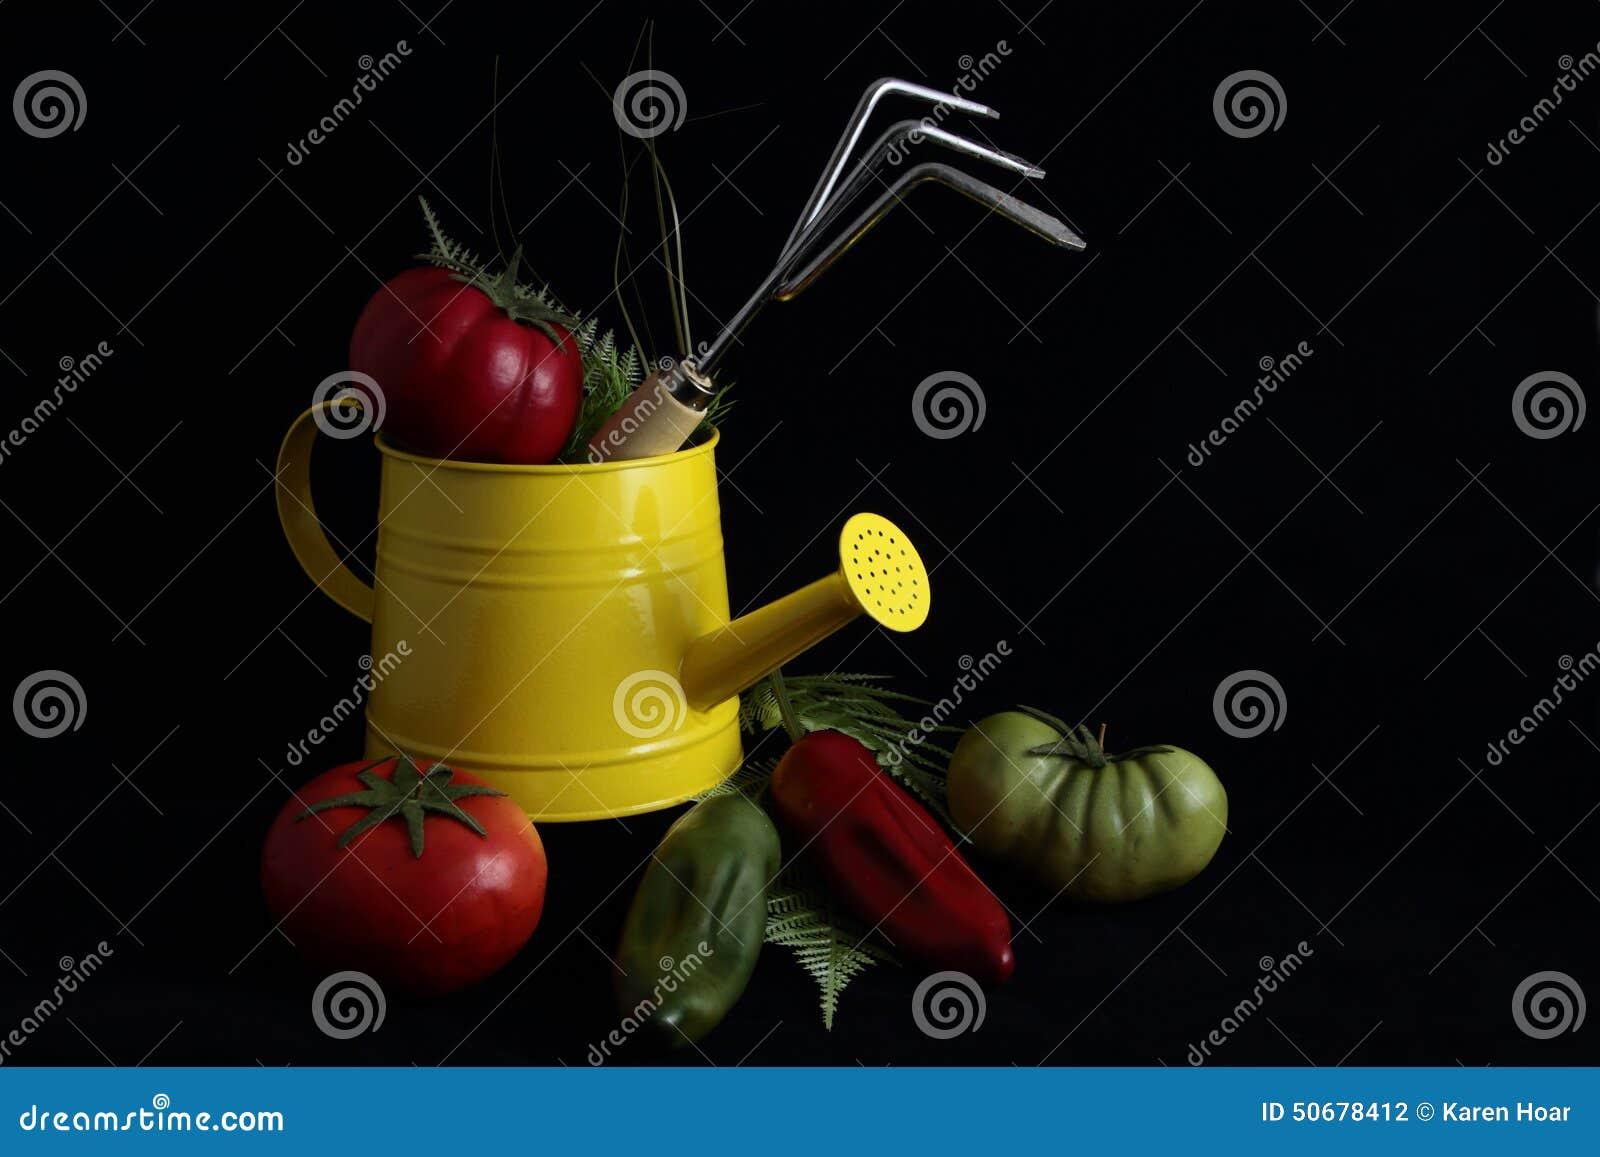 Download 与菜的从事园艺的静物画 库存照片. 图片 包括有 黑暗, 墨西哥胡椒, 摄影, 侧灯, 微弱光线, lit - 50678412